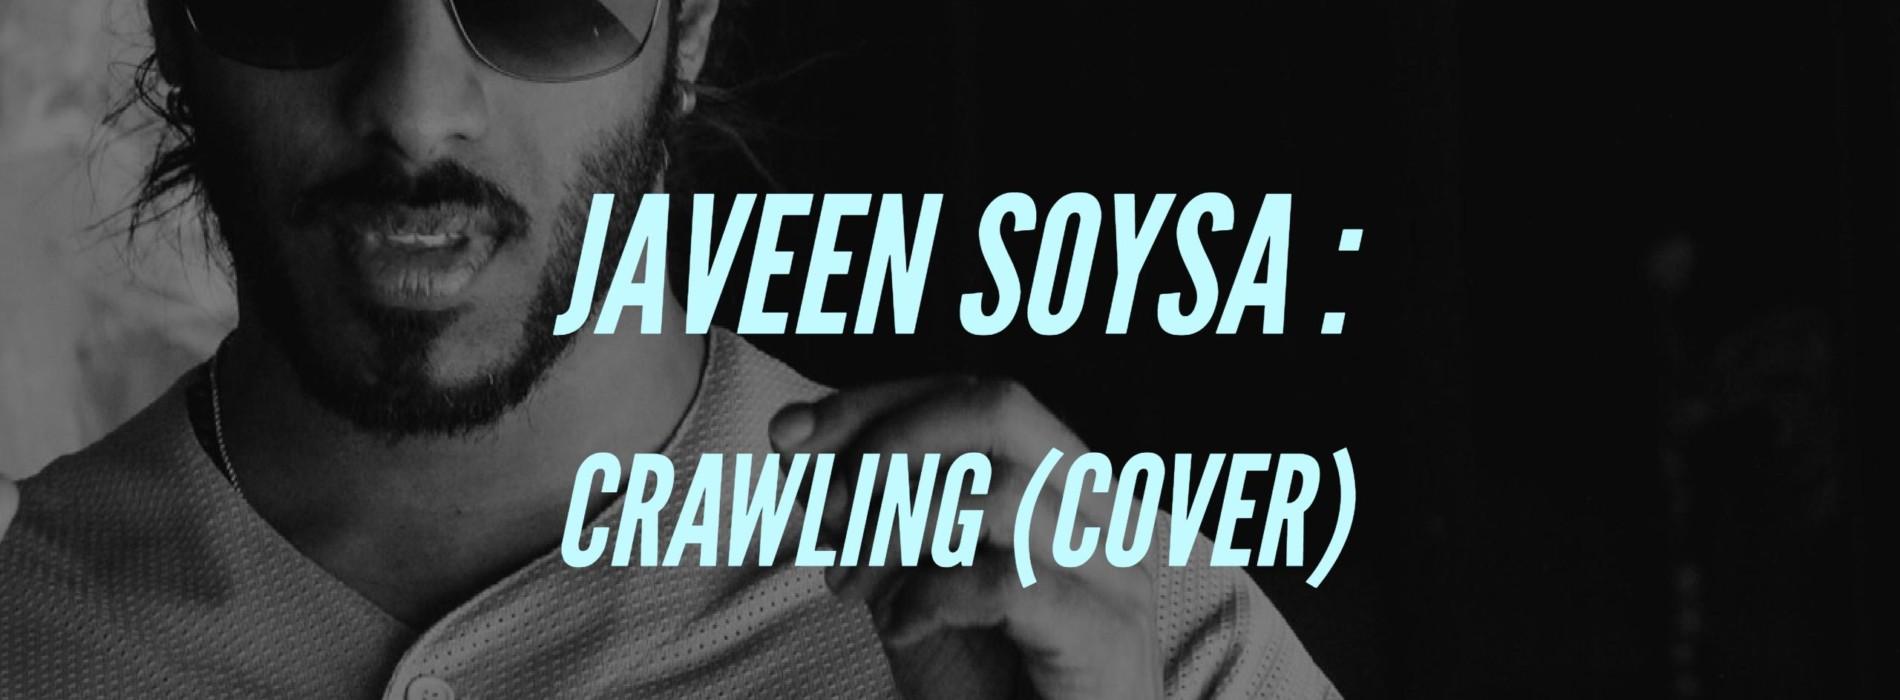 Javeen Soysa : Crawling (cover)